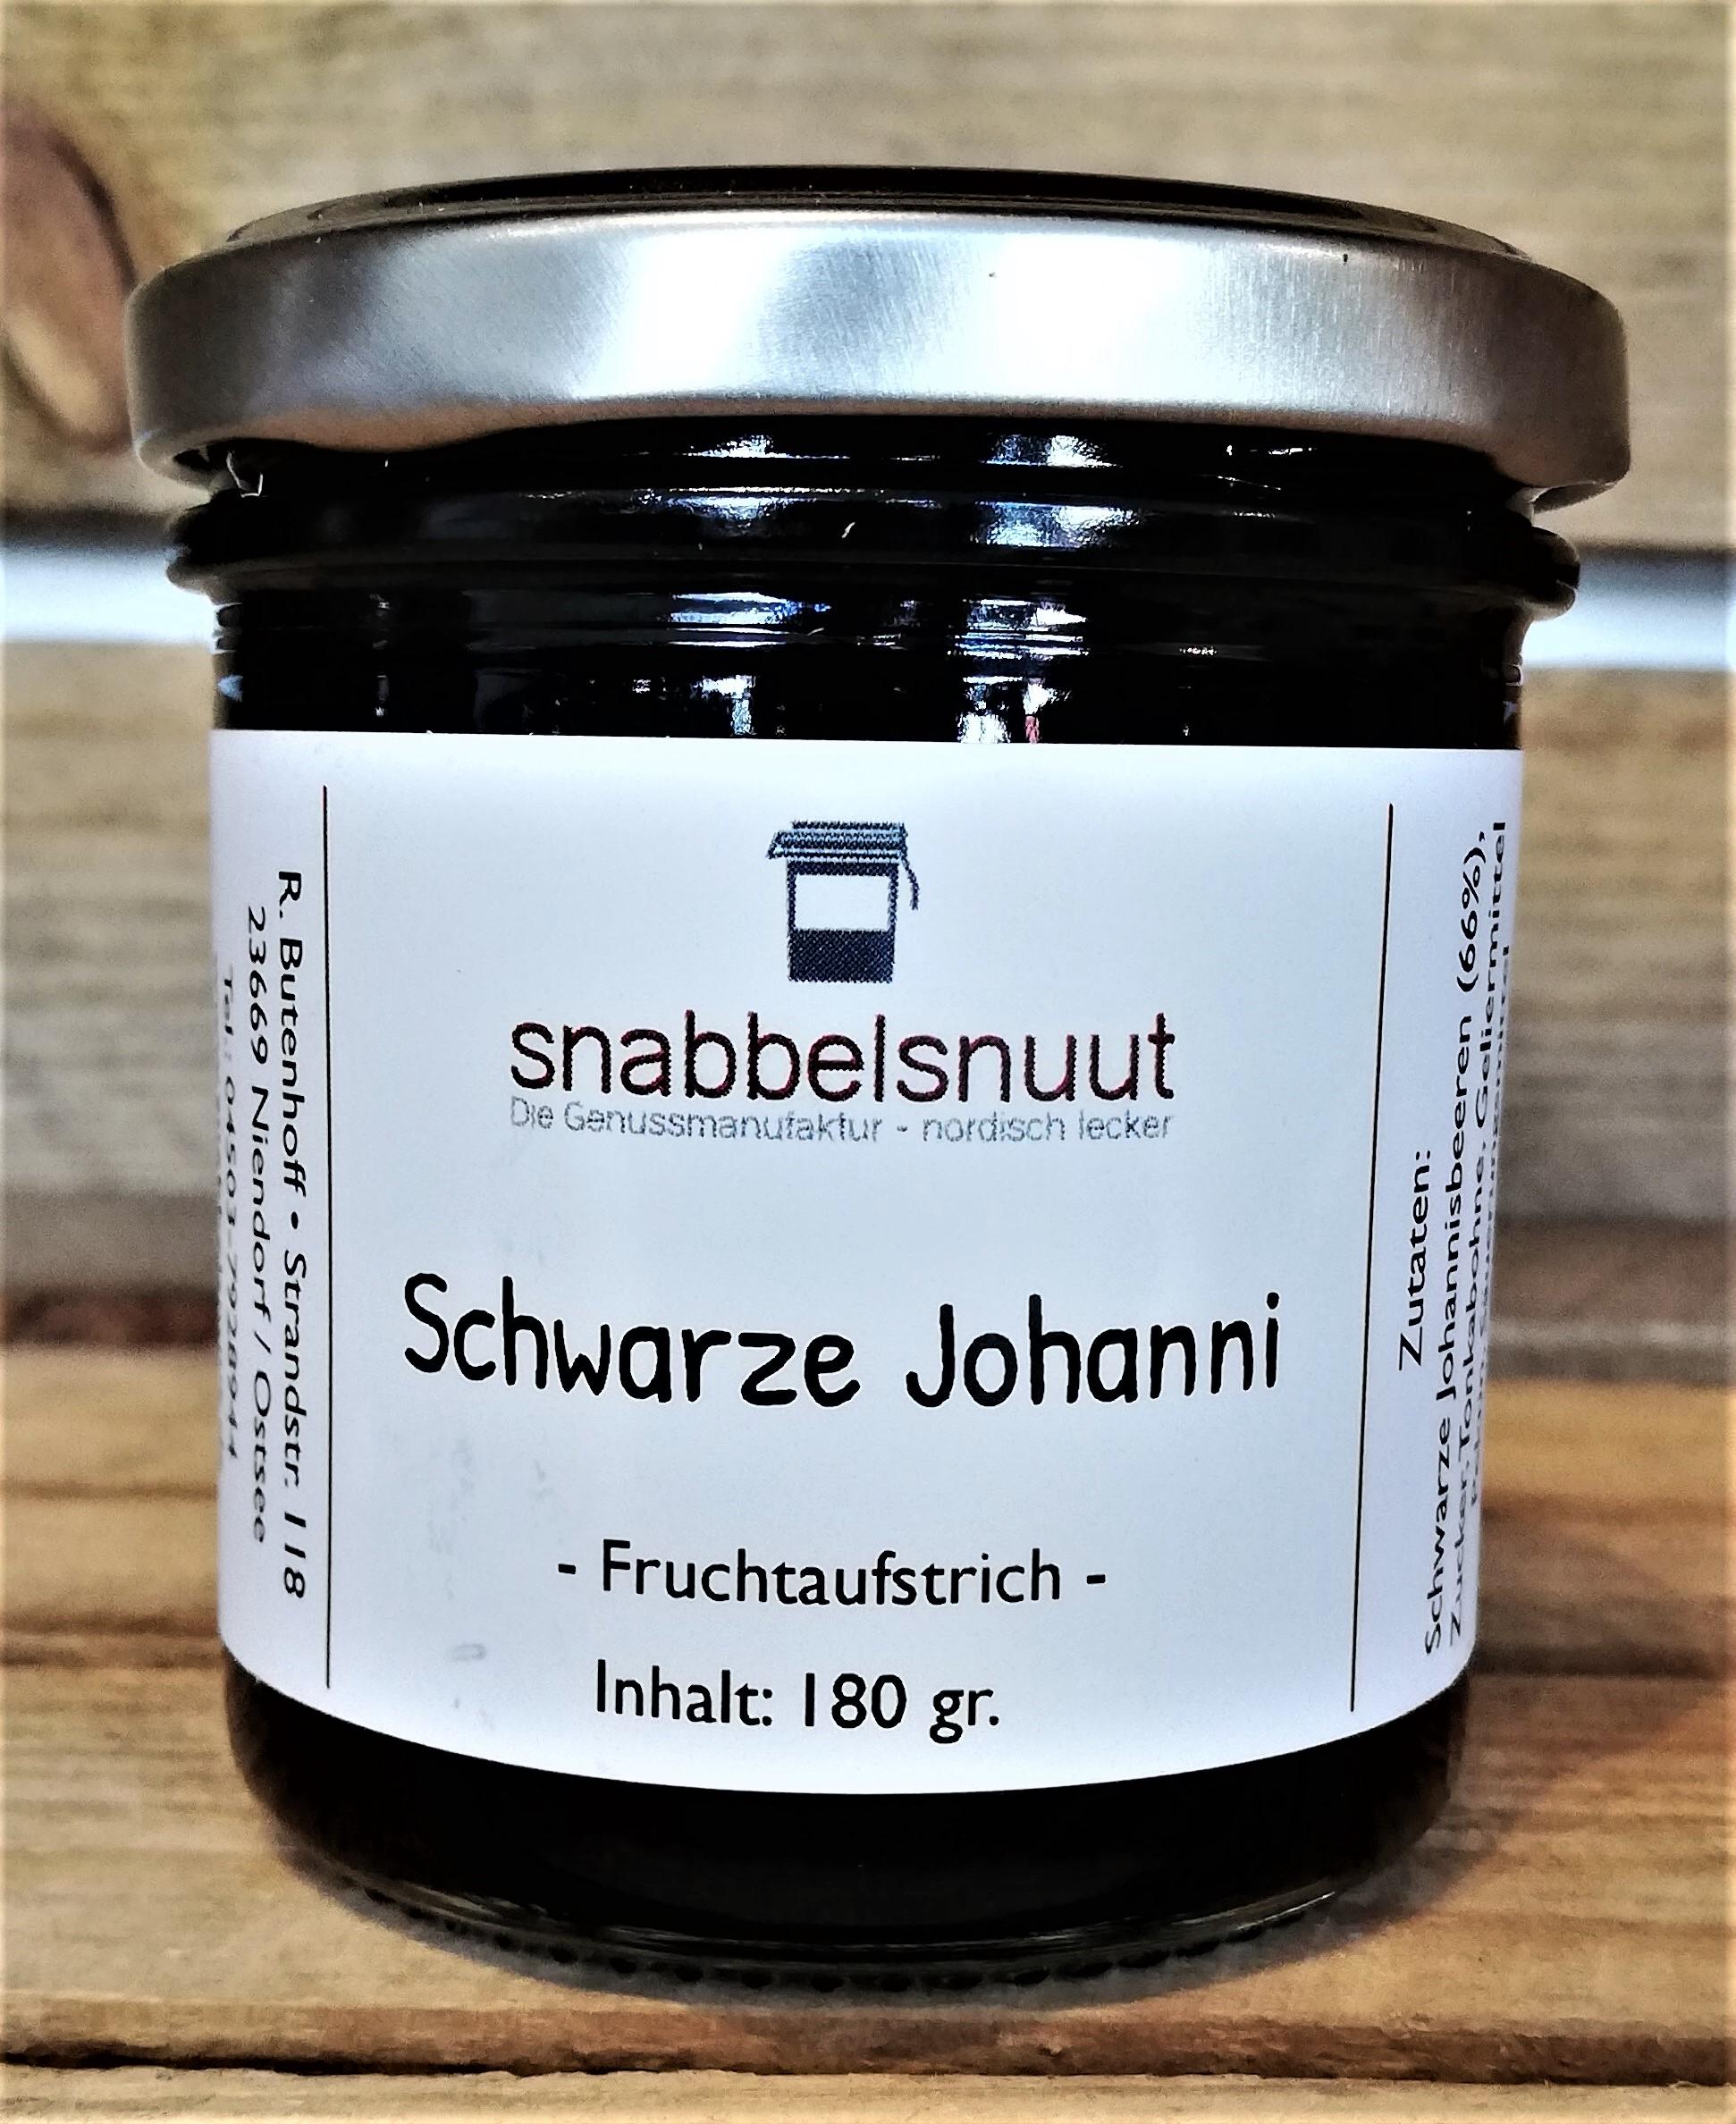 Schwarze Johanni